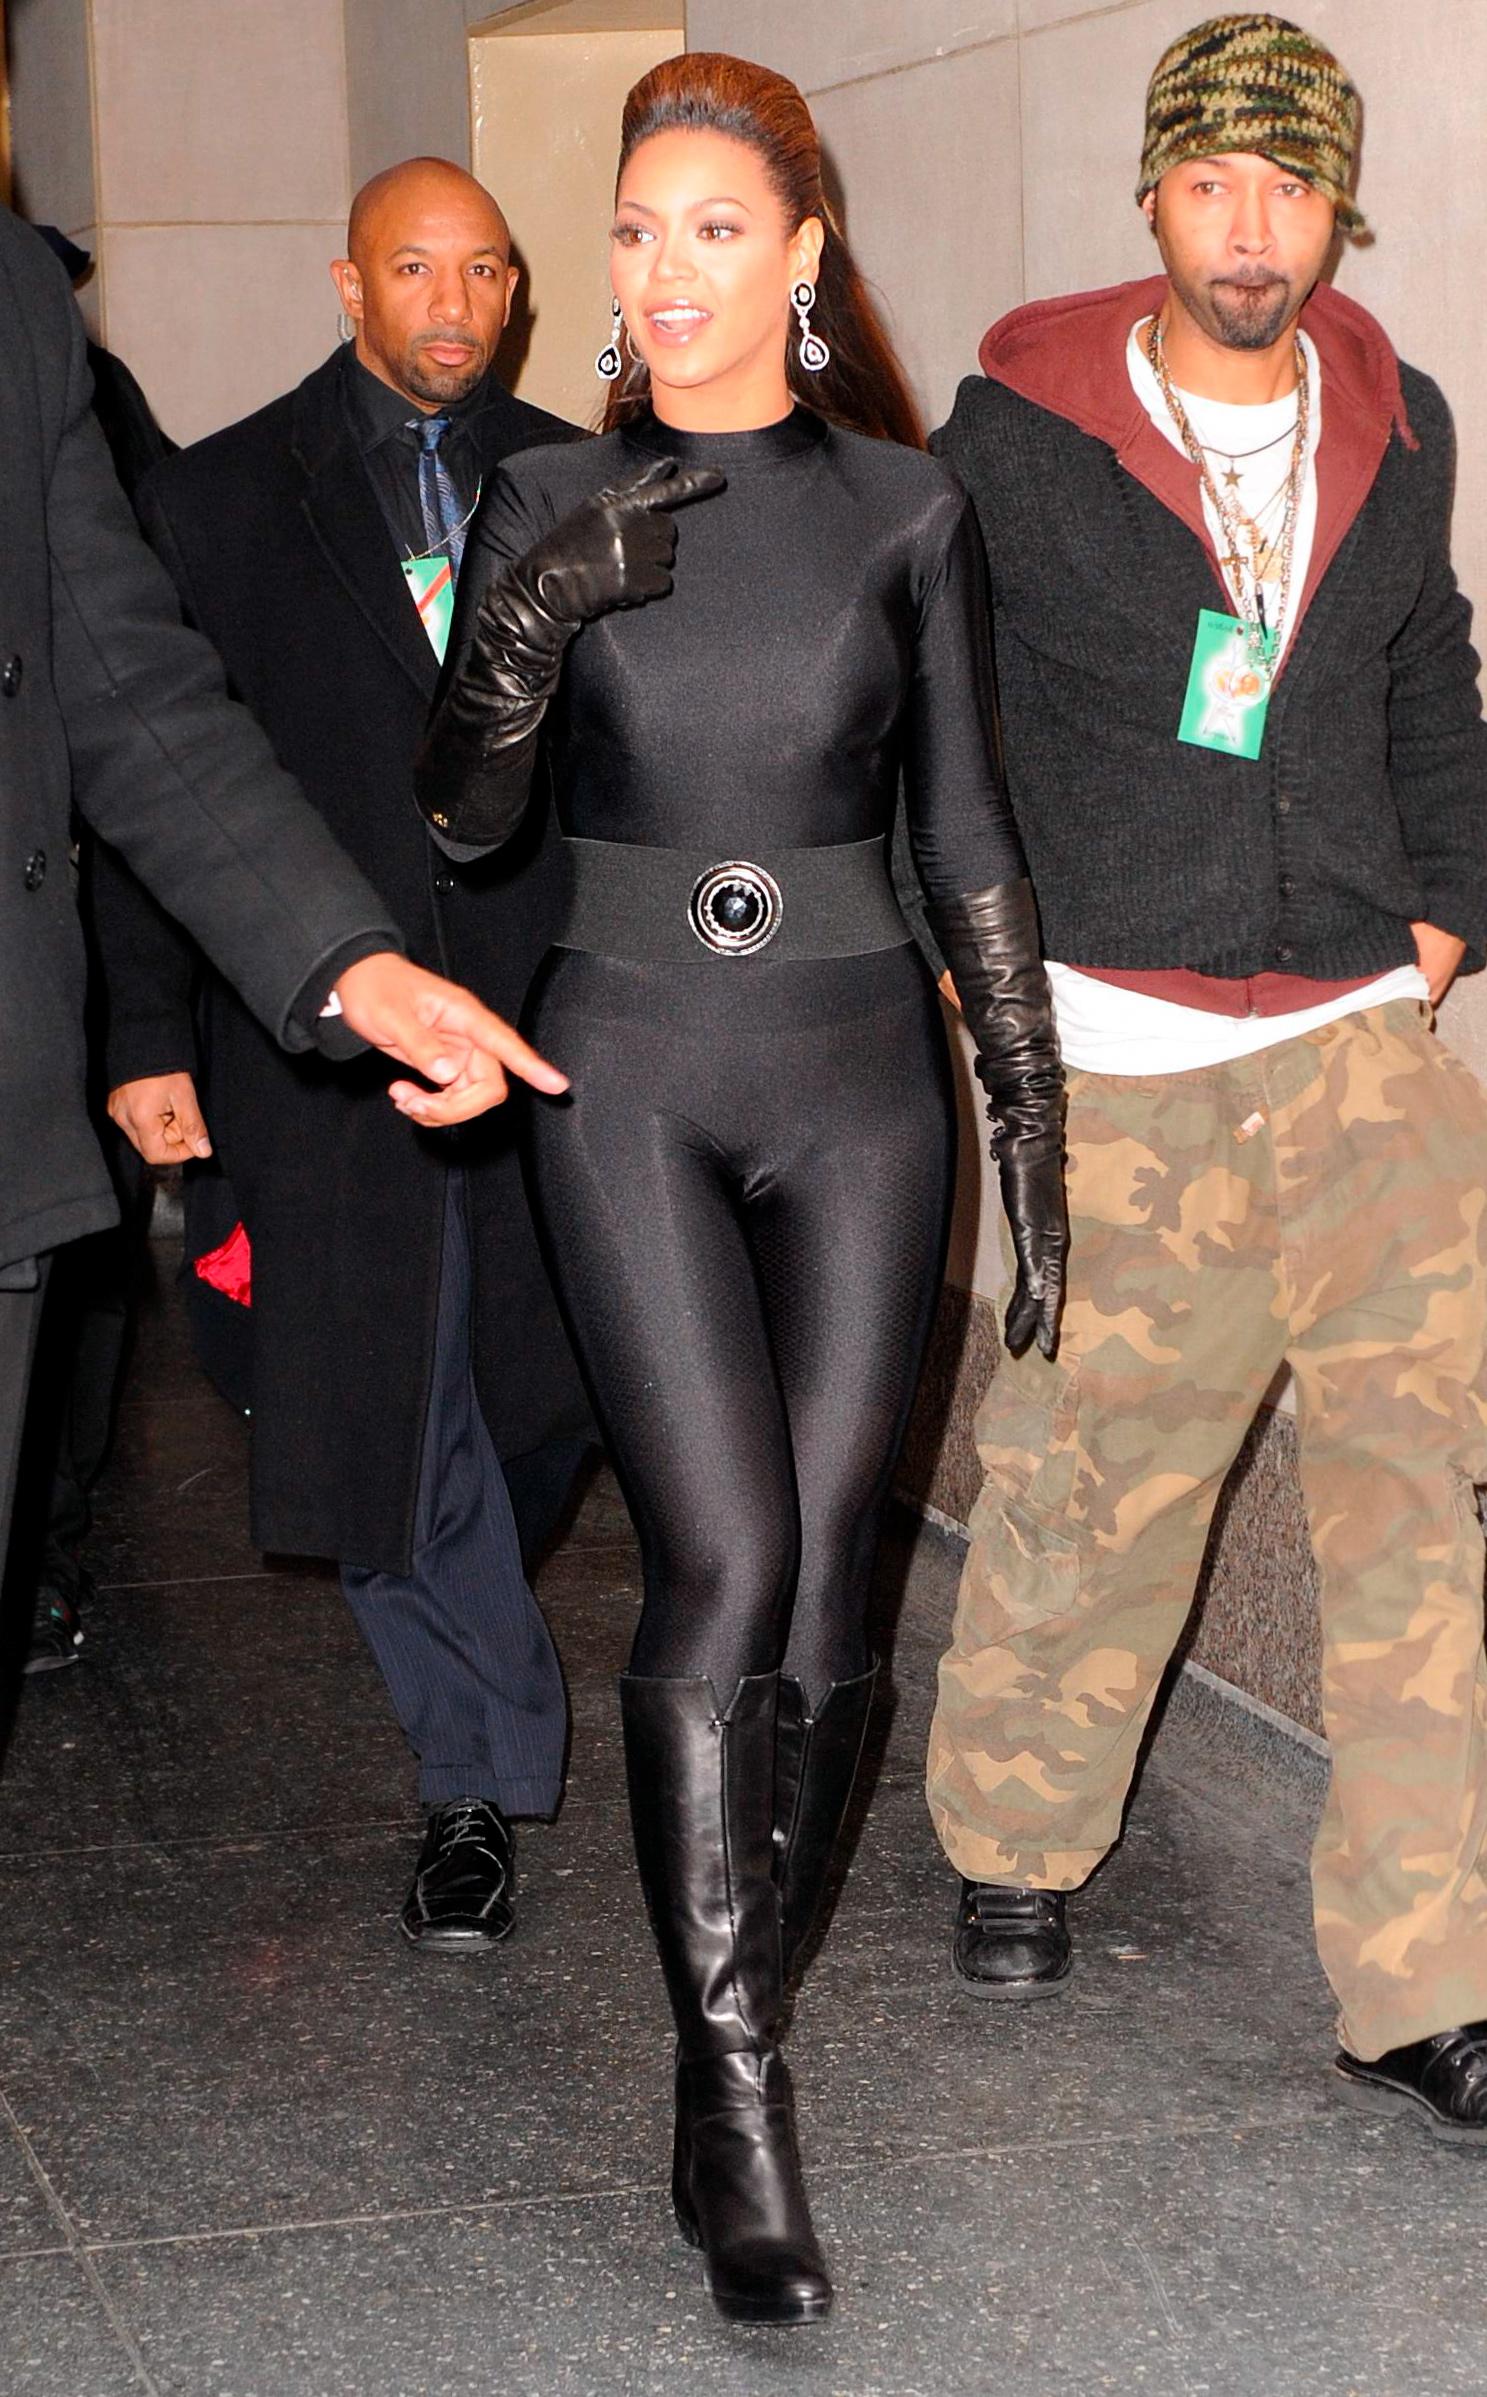 84144_Beyonce_2008-11_NBC_Today_Show_243_122_945lo.jpg